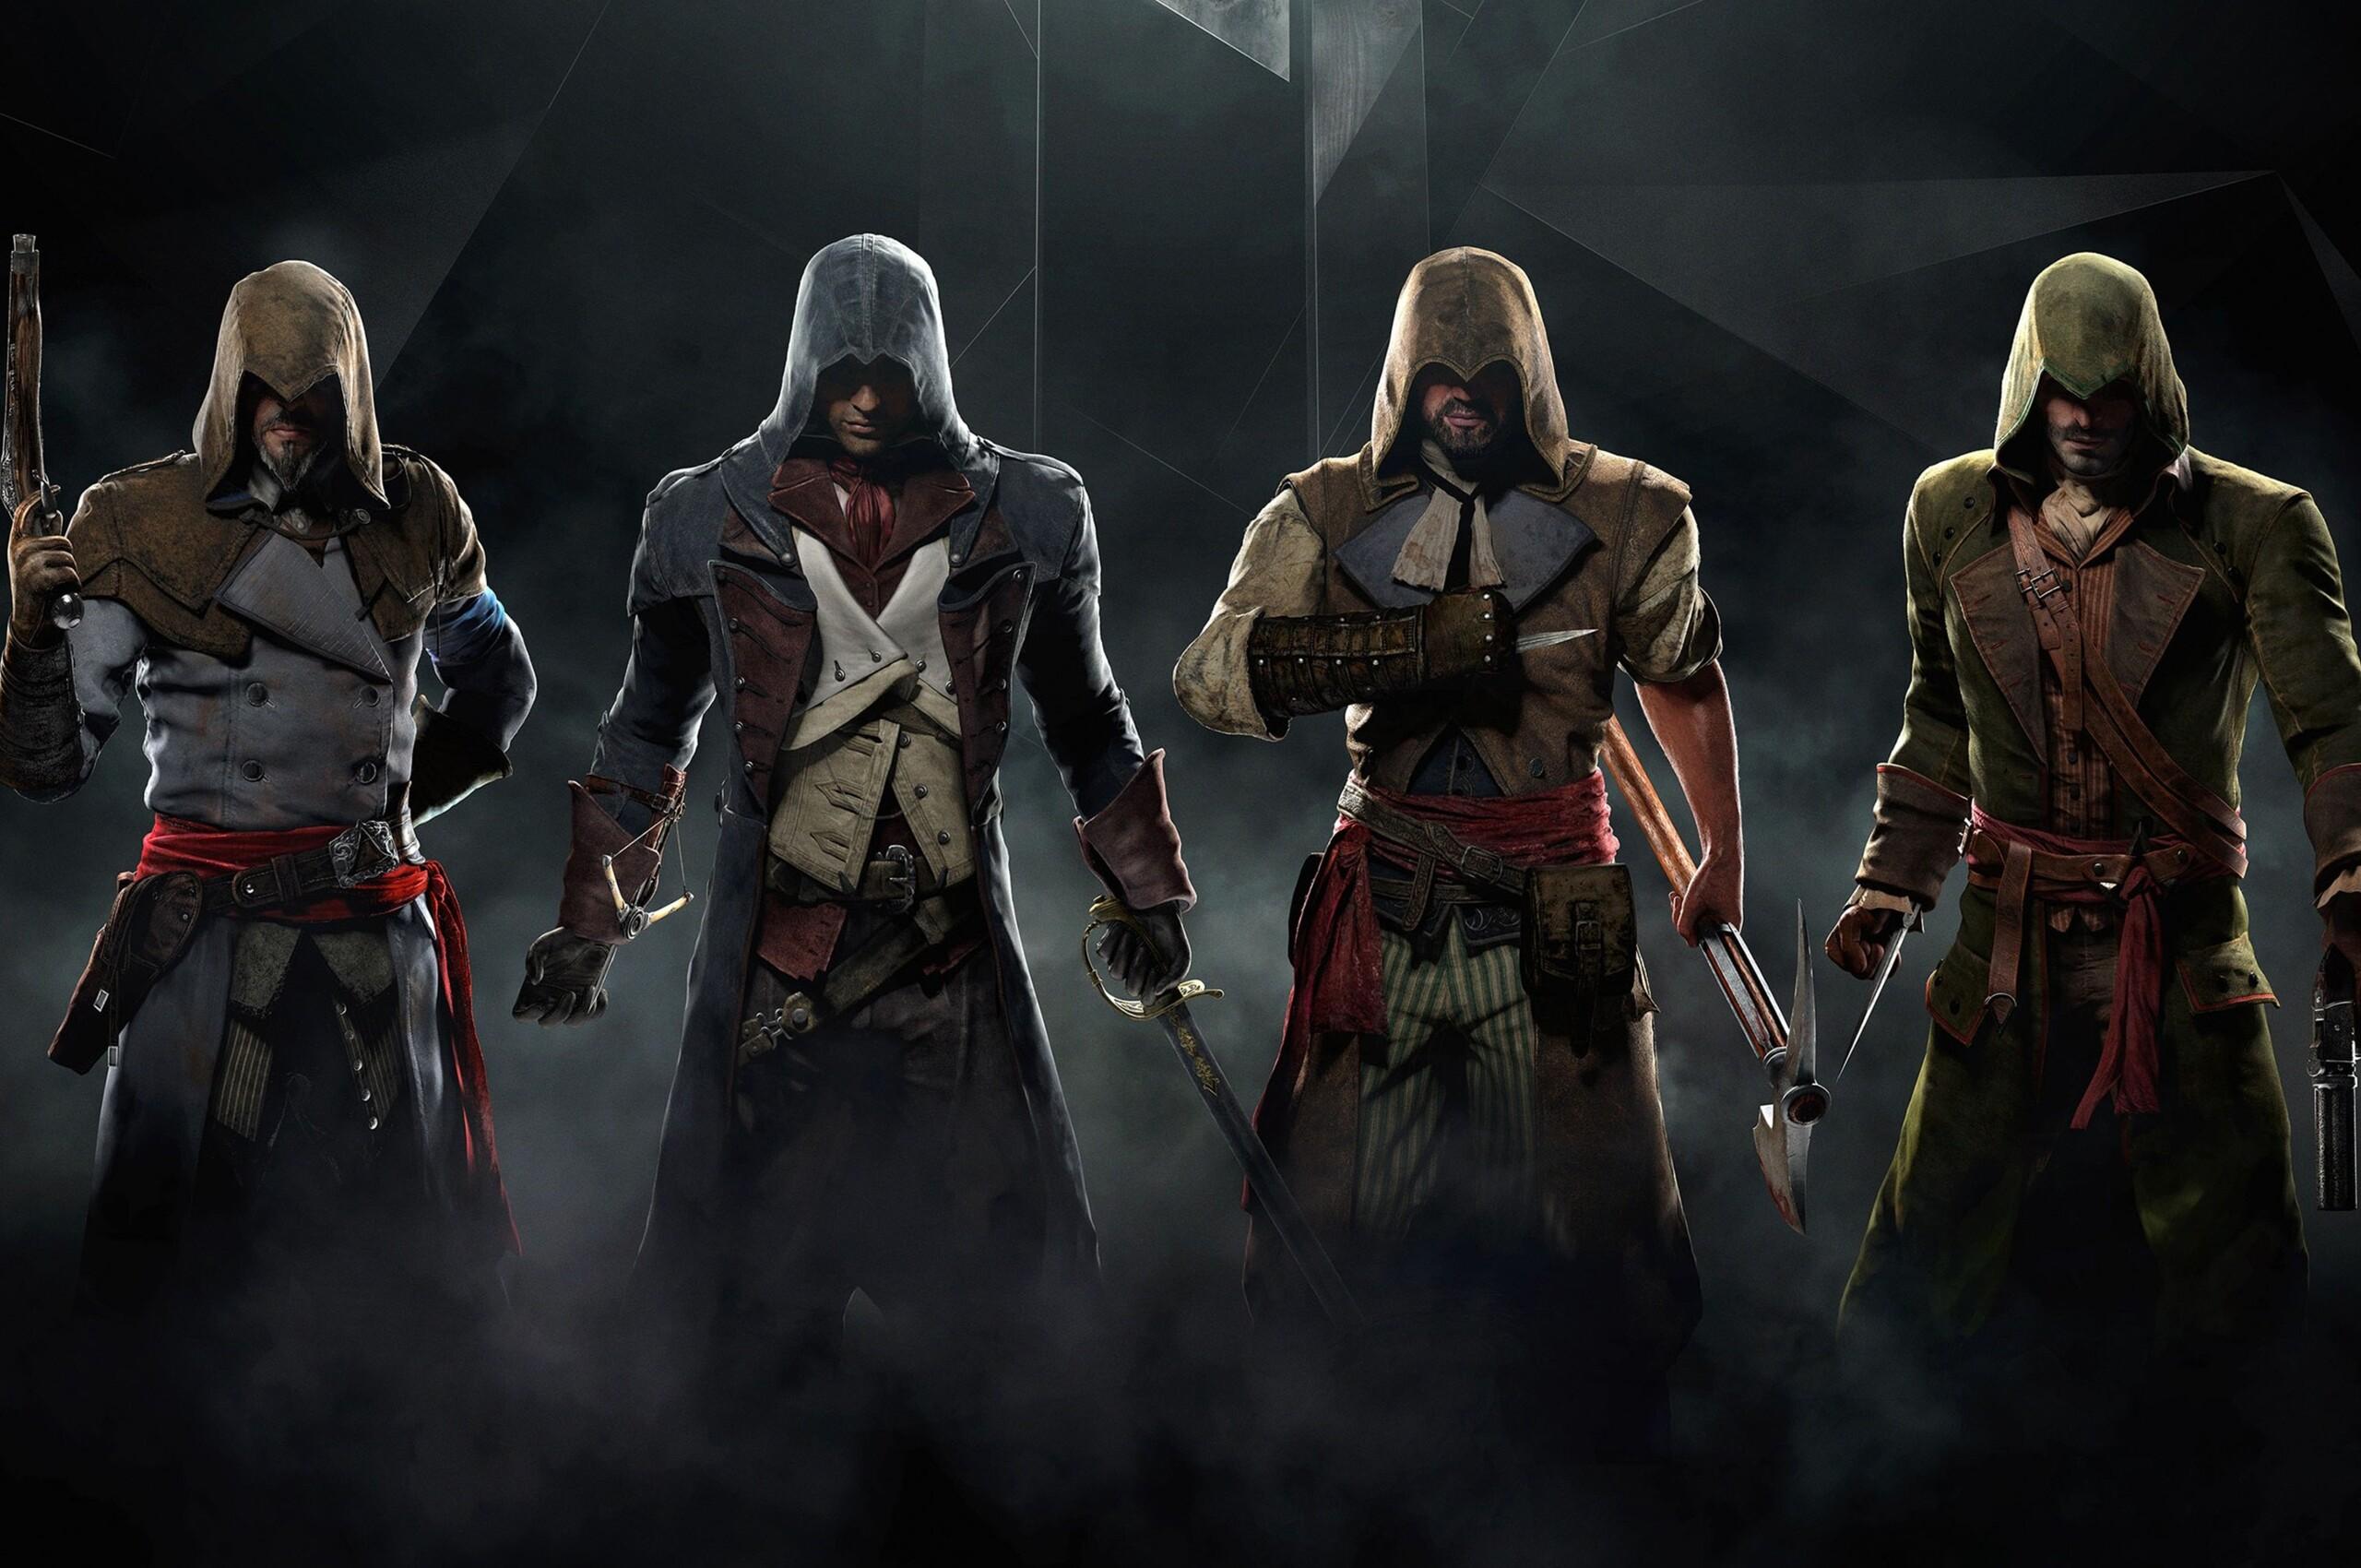 2560x1700 Assassins Creed Unity Game Desktop Chromebook Pixel HD 4k